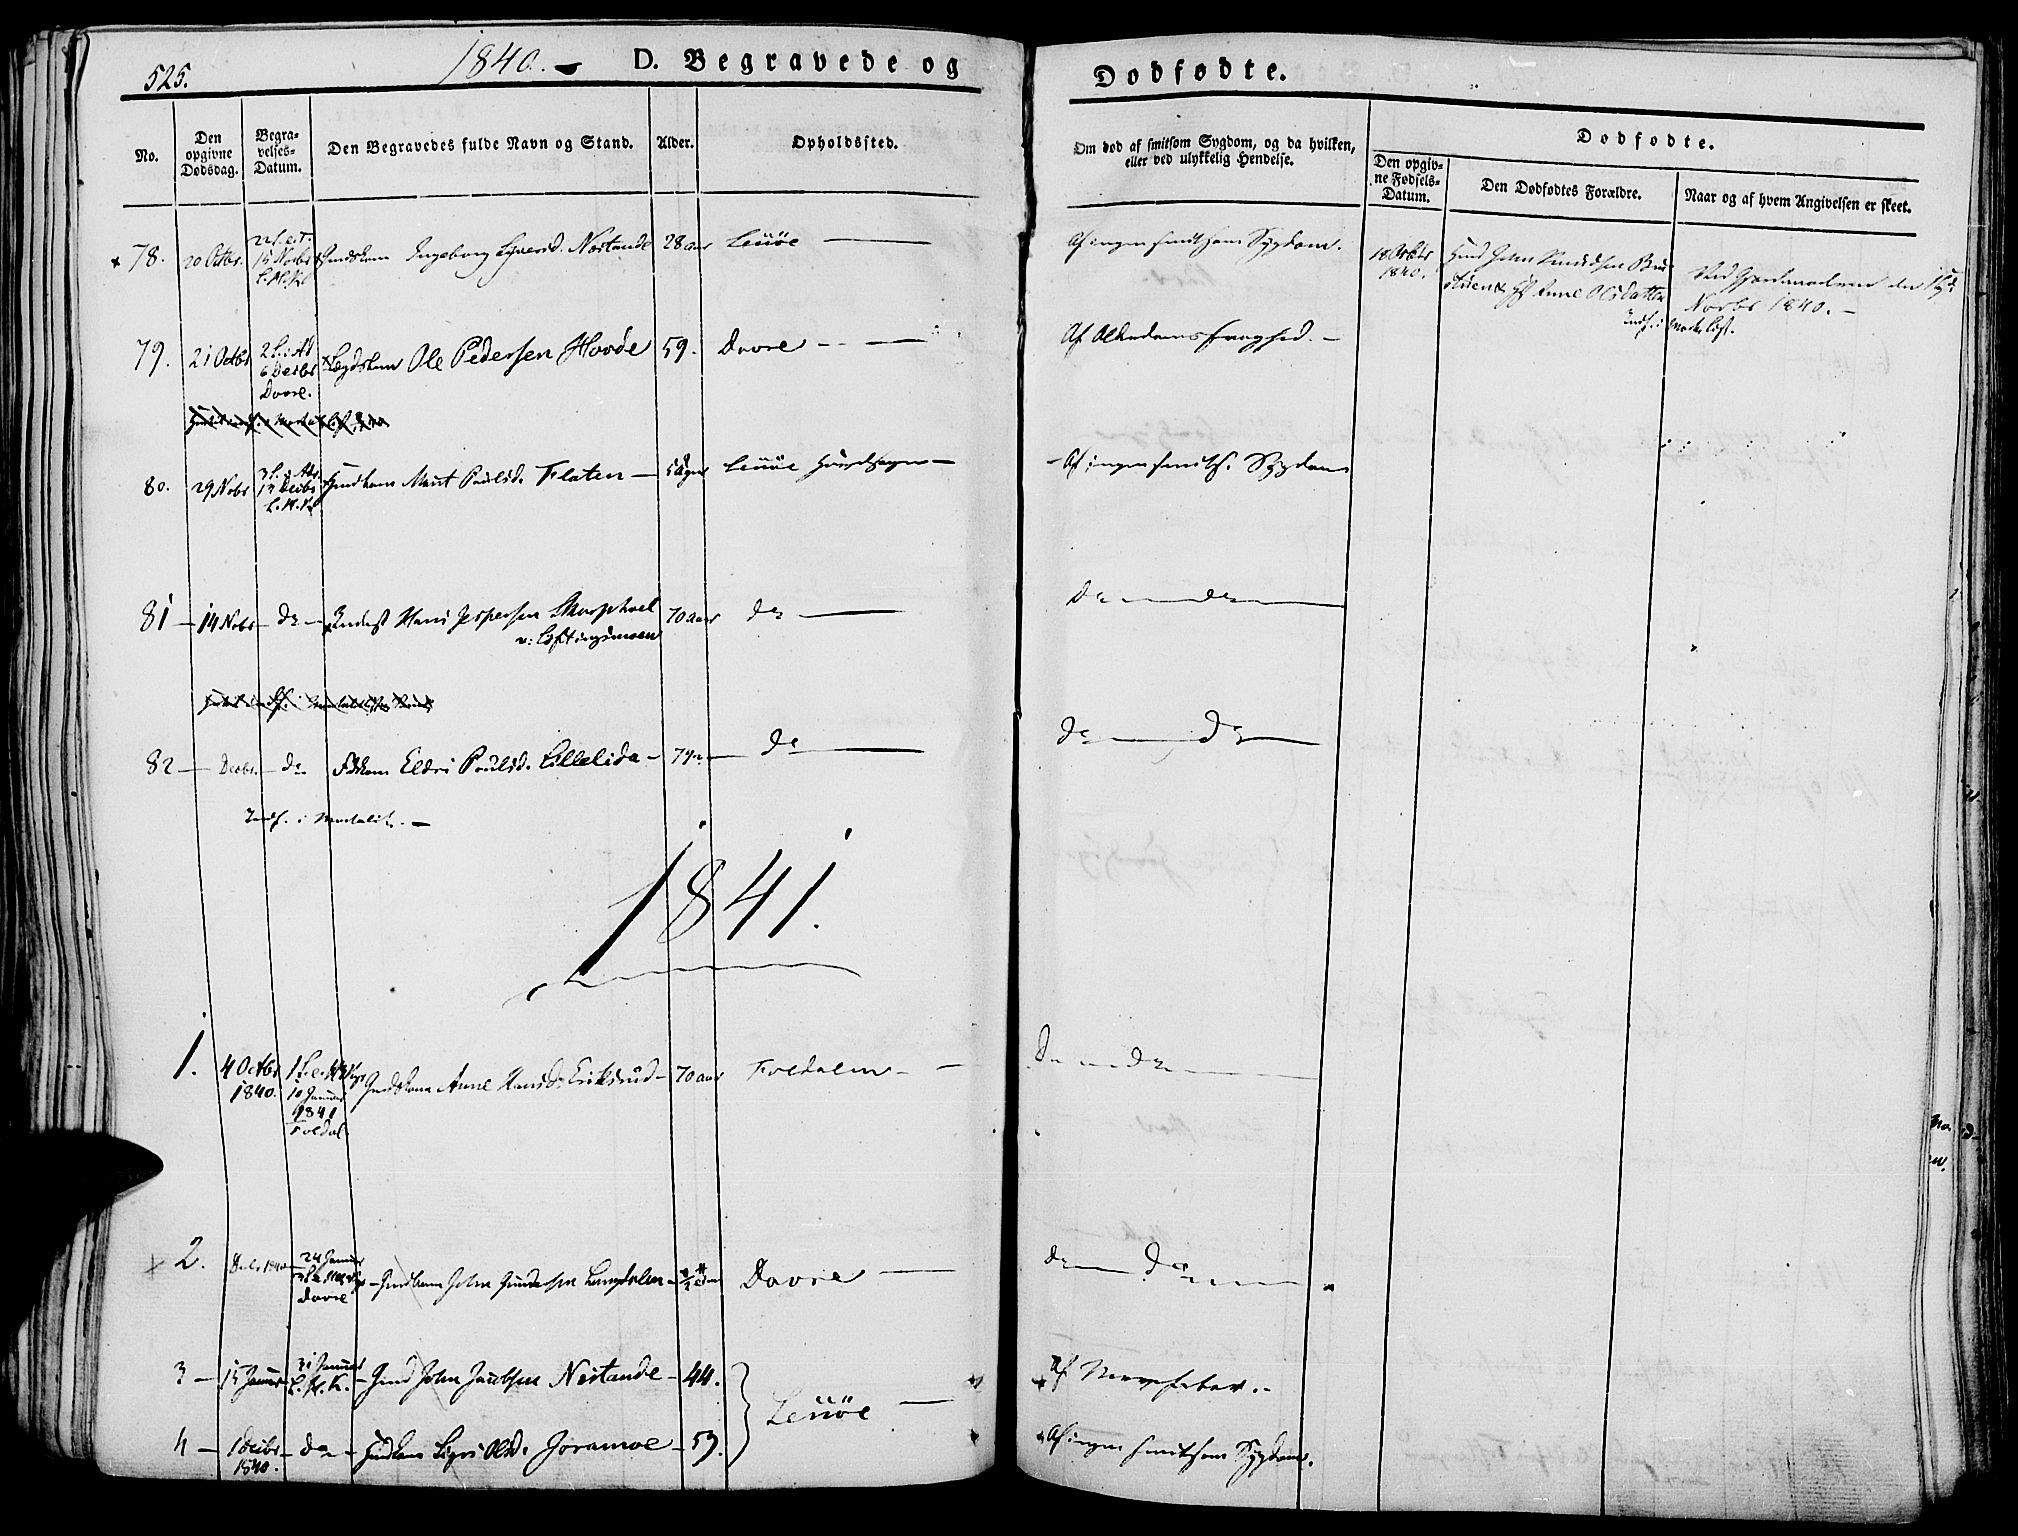 SAH, Lesja prestekontor, Ministerialbok nr. 5, 1830-1842, s. 525